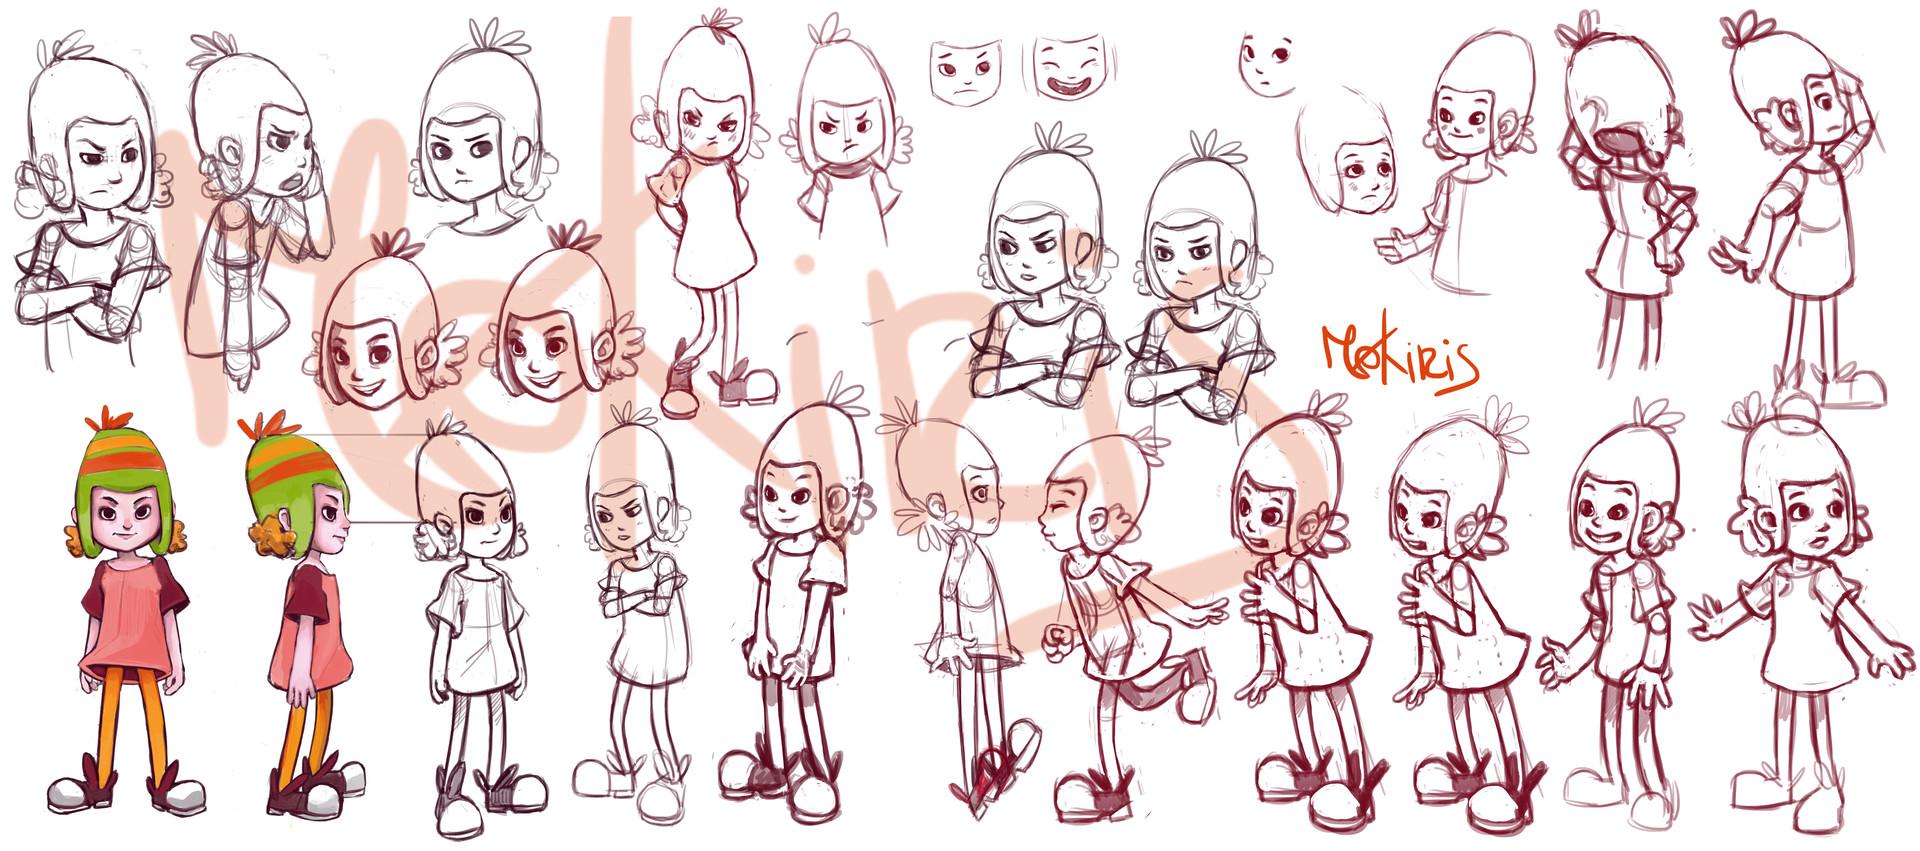 Animation keys